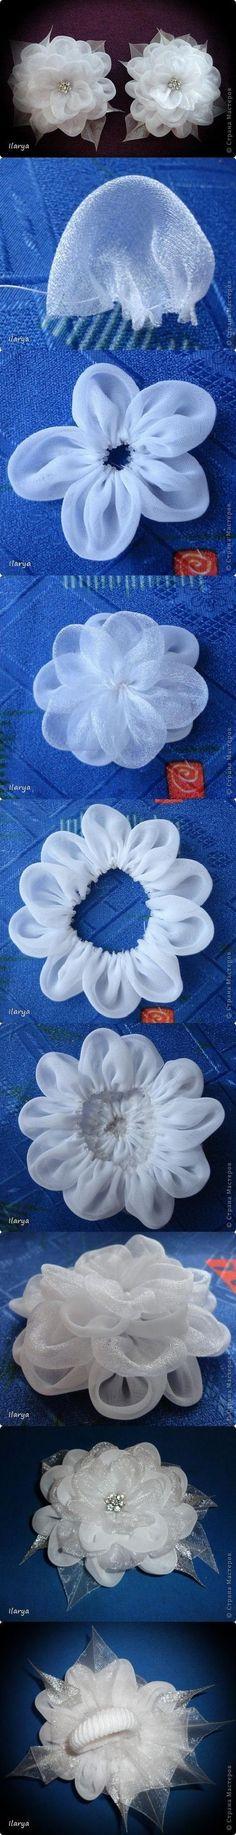 DIY Fabric Lust Flower DIY Projects by nadine